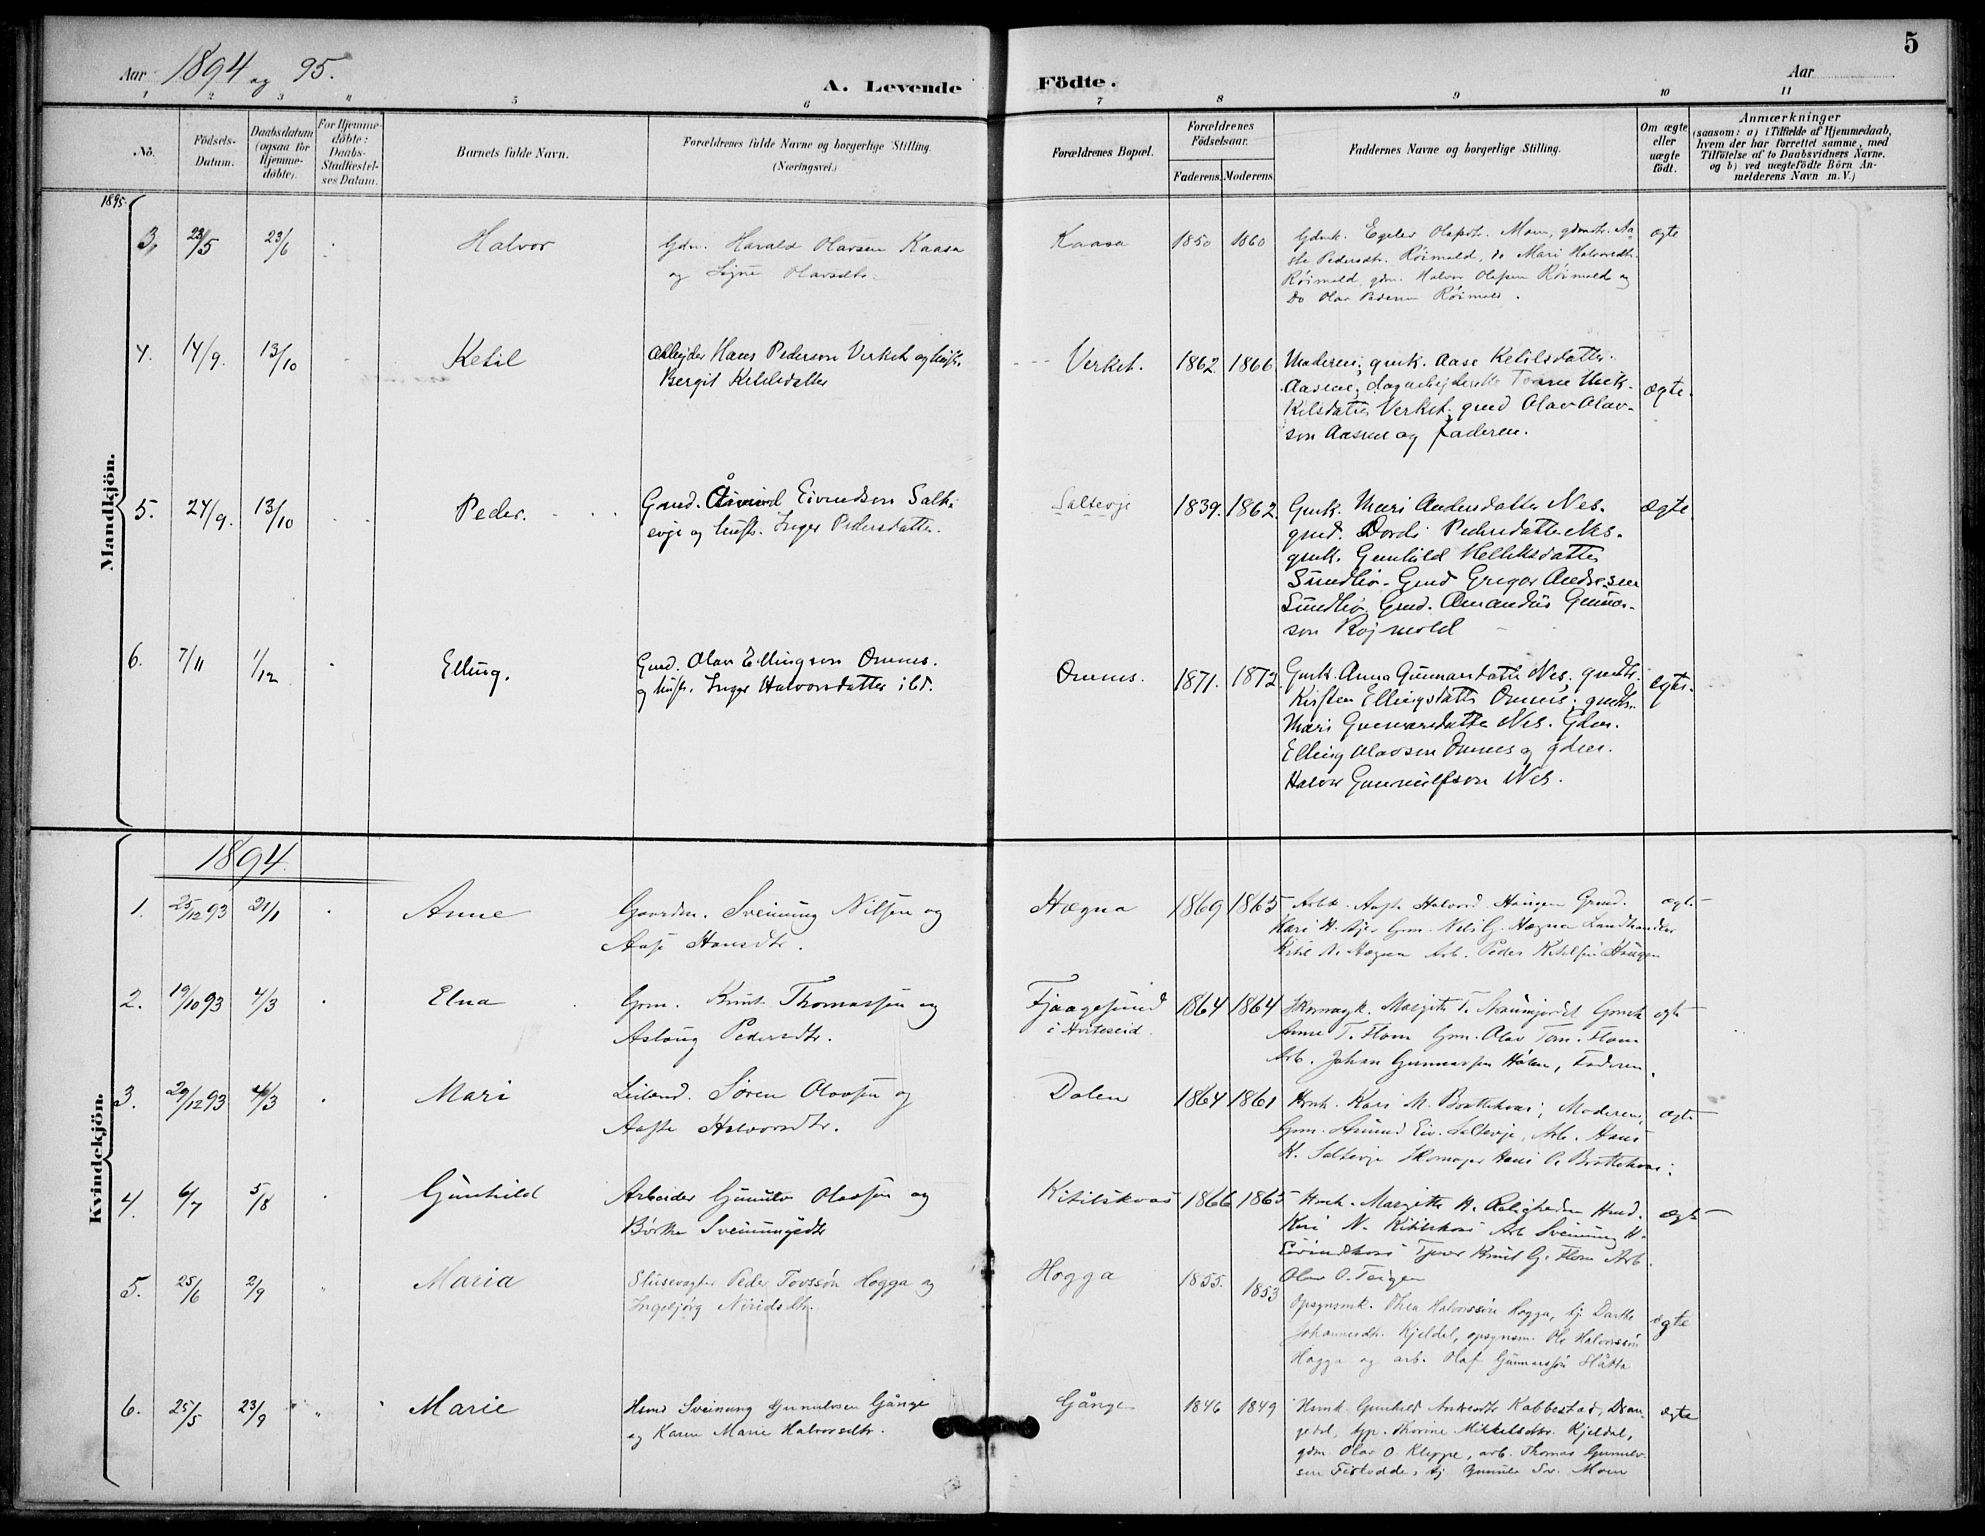 SAKO, Lunde kirkebøker, F/Fb/L0004: Ministerialbok nr. II 4, 1892-1907, s. 5